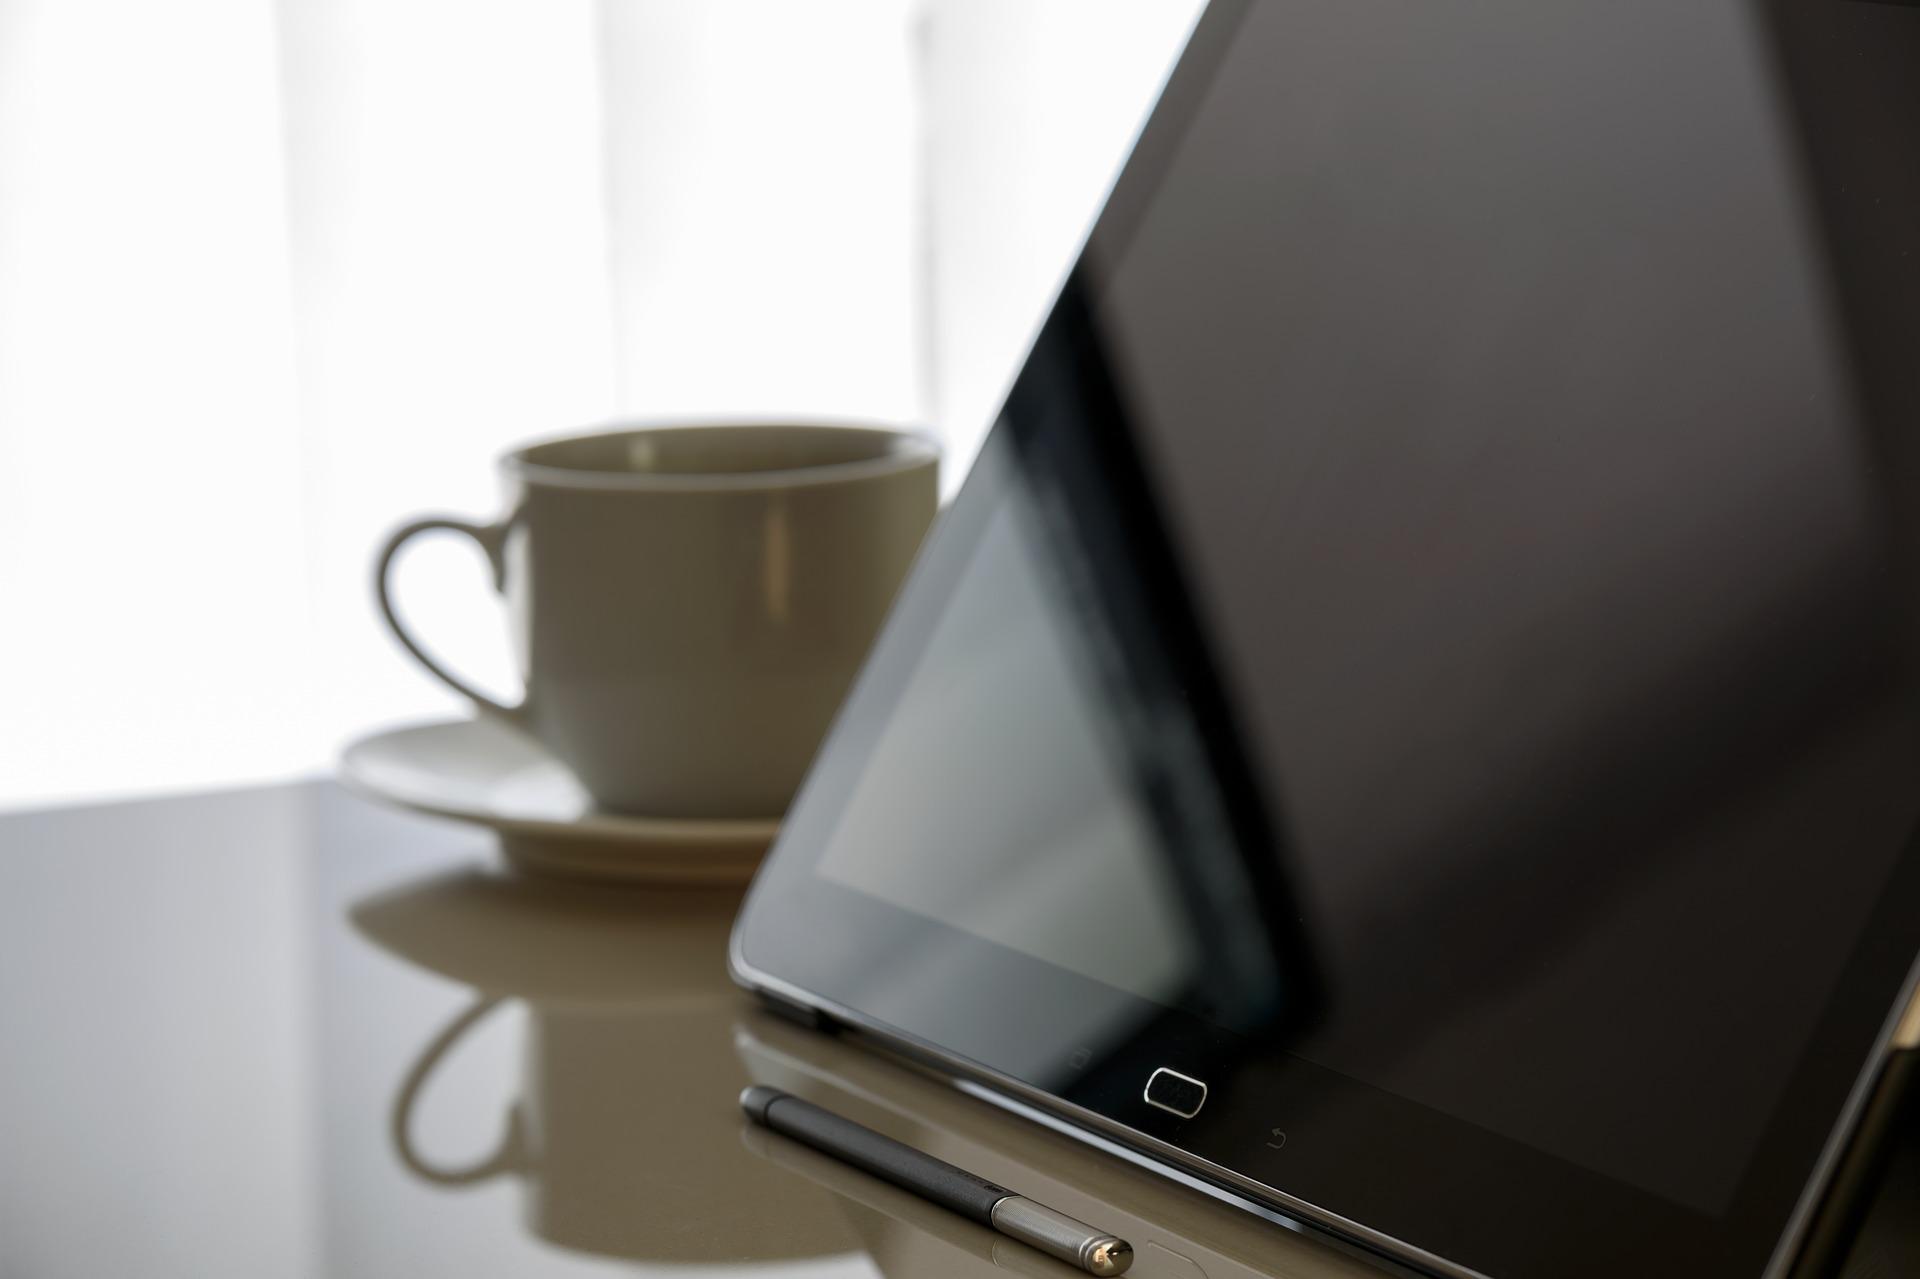 tablet-1939255_1920